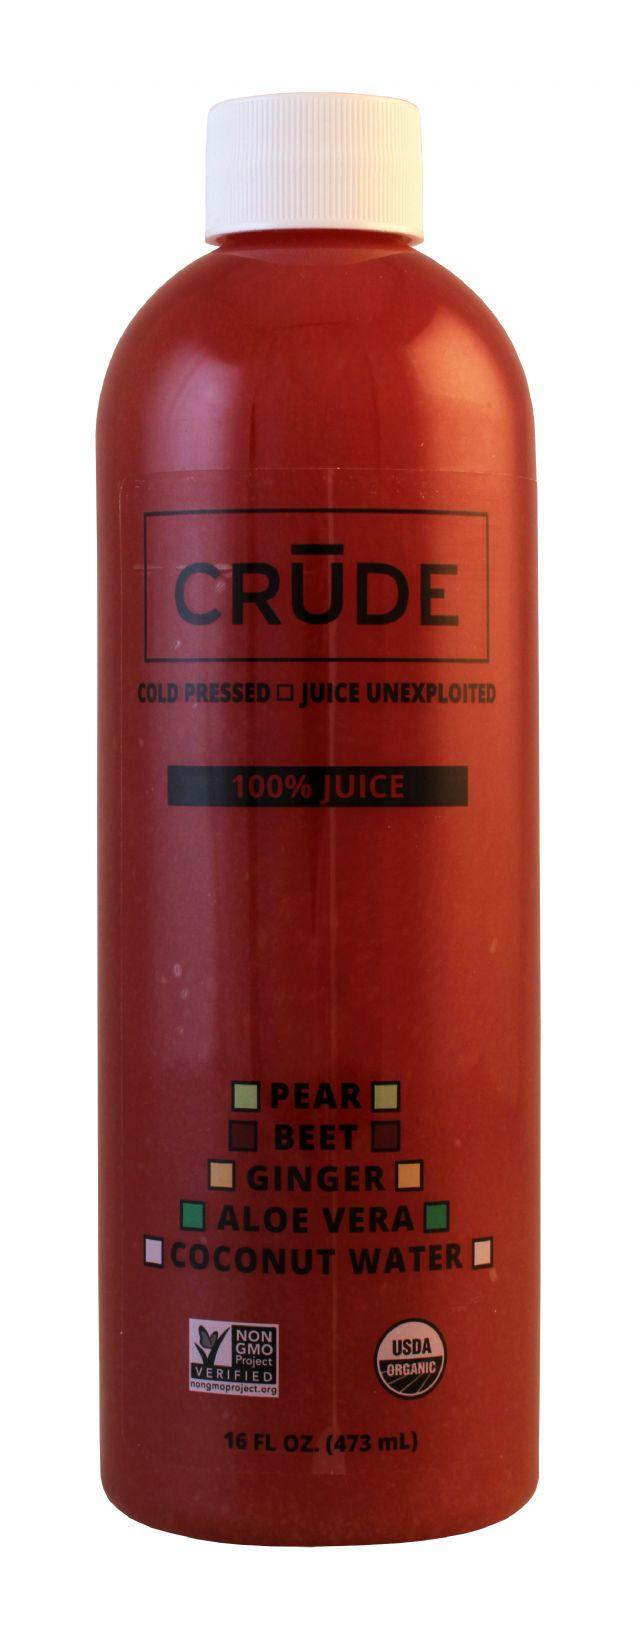 Crude: Crude Pear Front